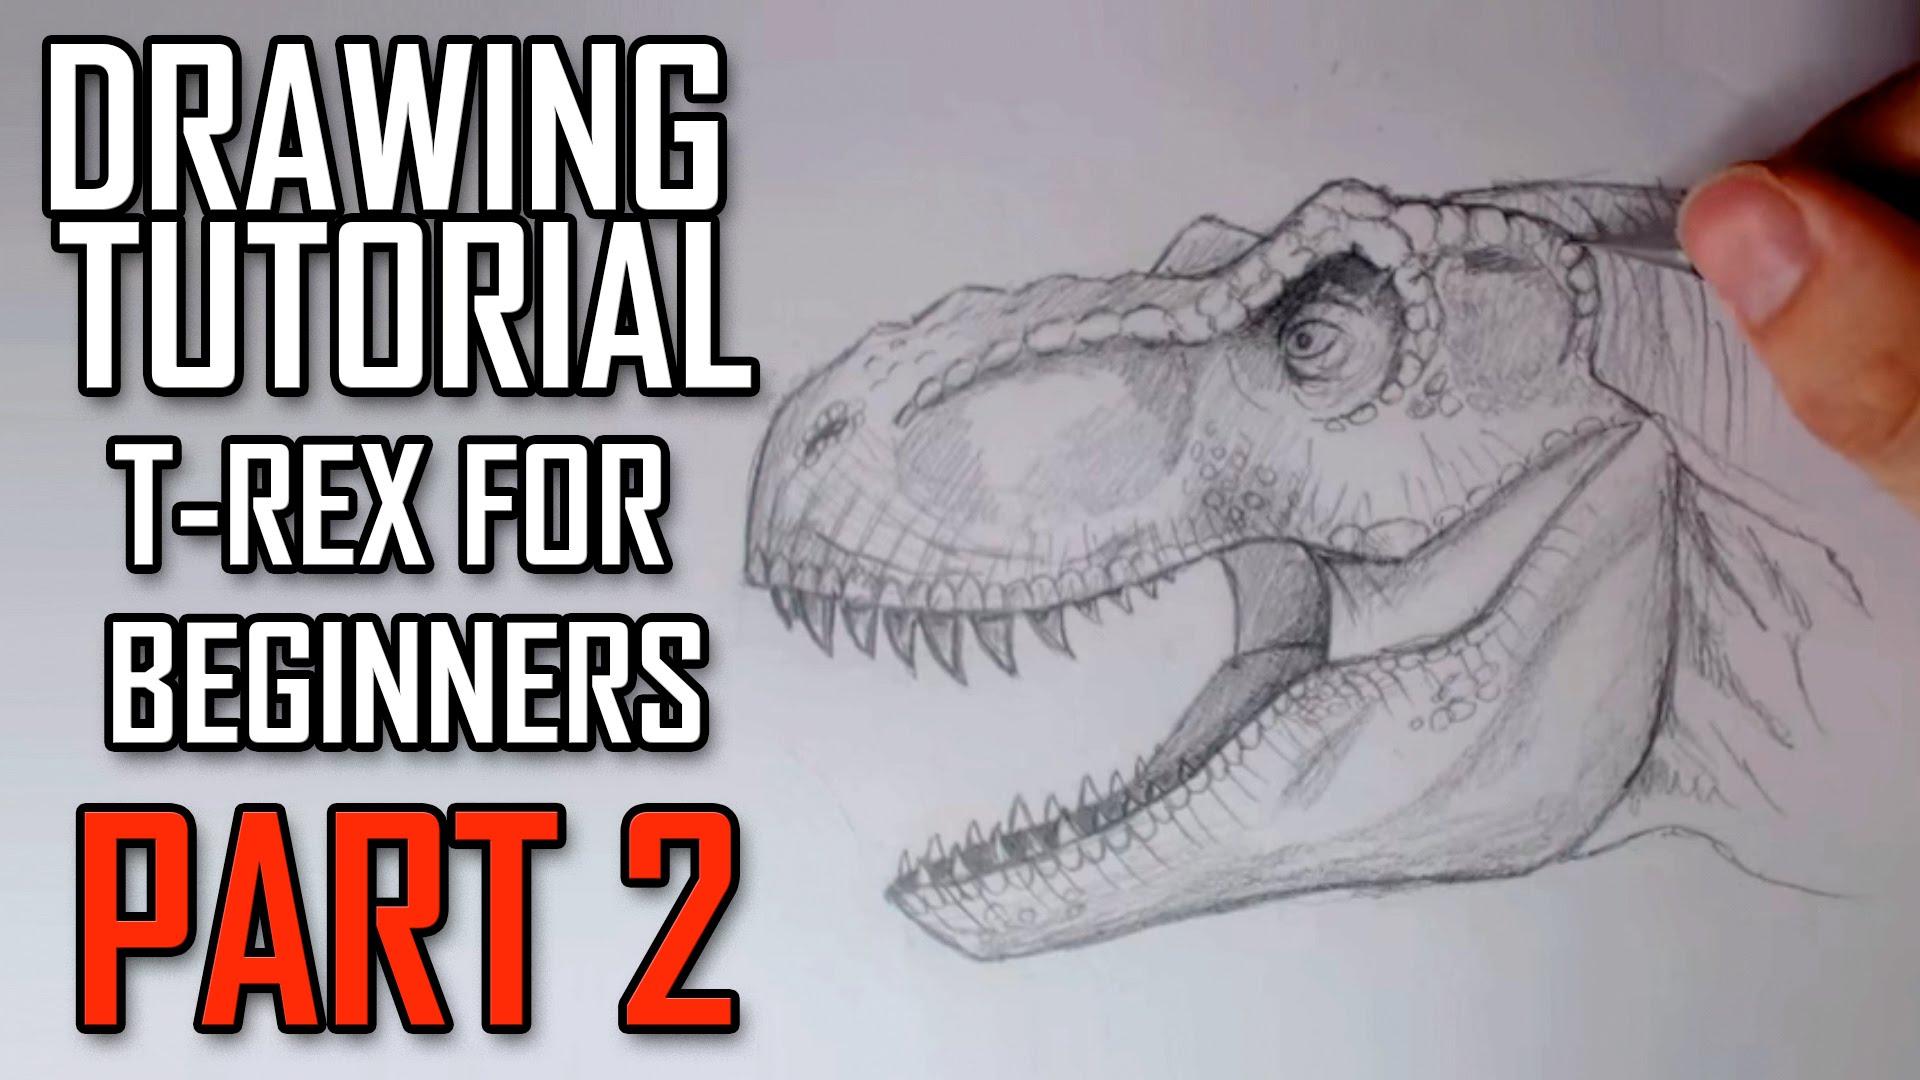 1920x1080 Learn How To Draw A Jurassic Park Trex Head For Intermediates